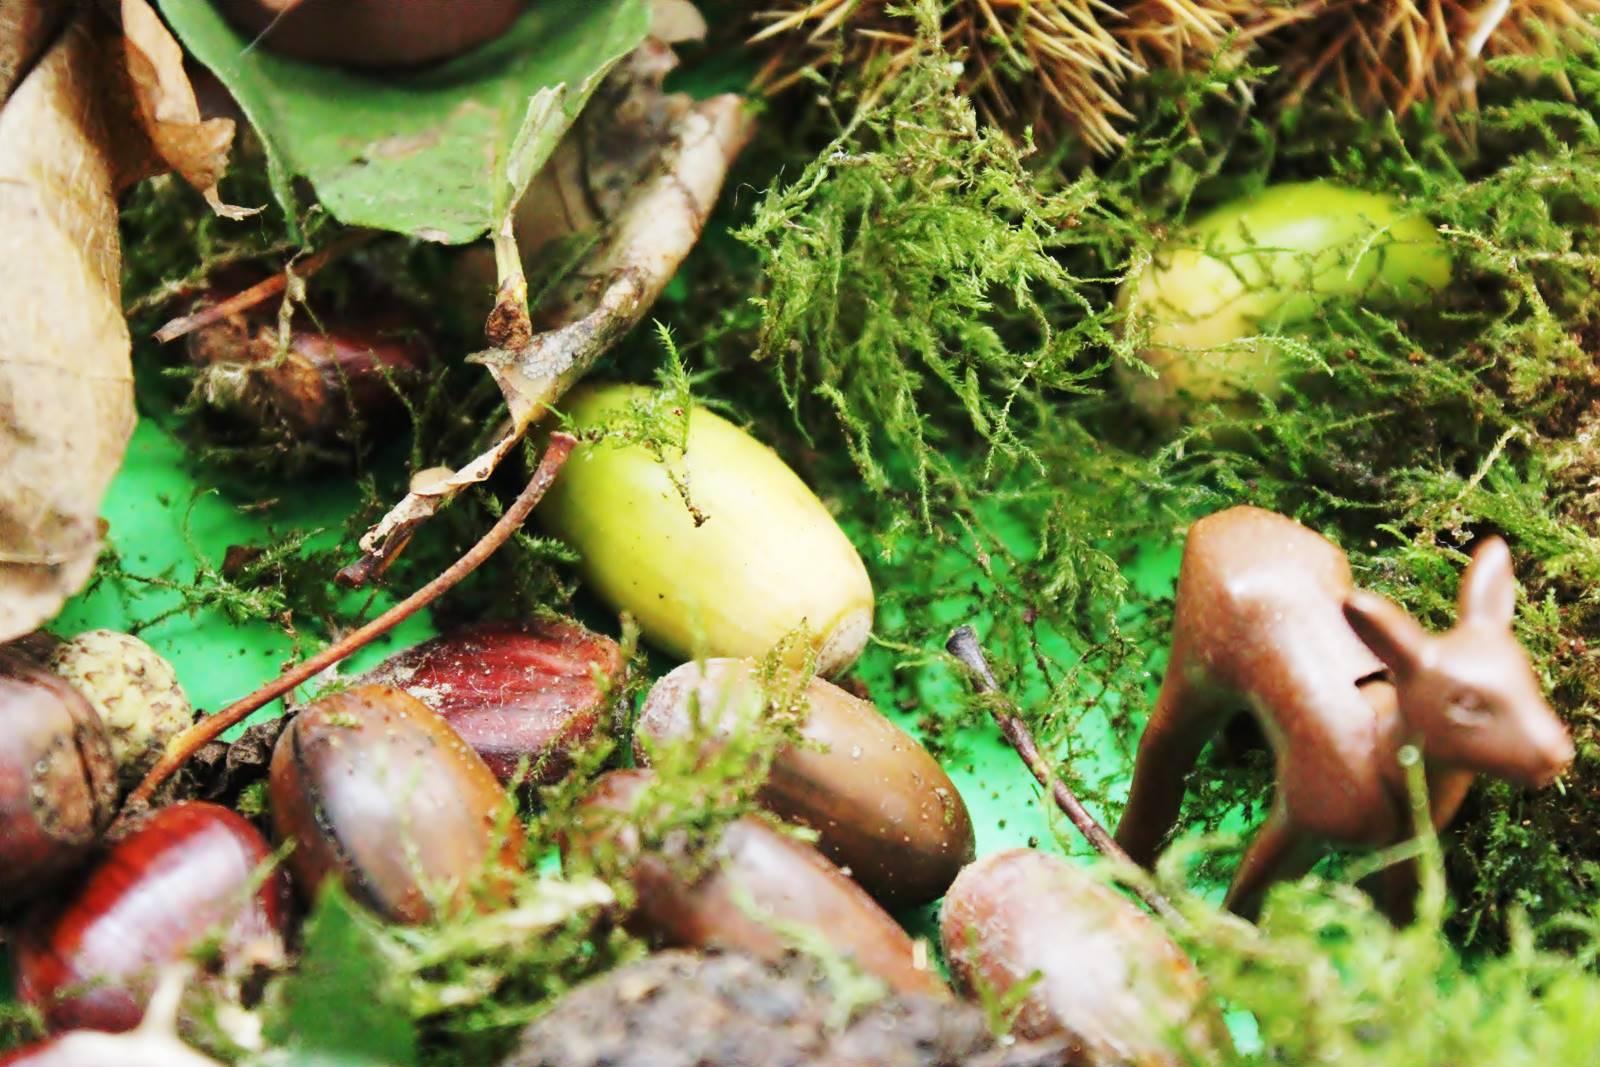 Table des saisons steiner waldorf ief homescooling ecole maison automne 6